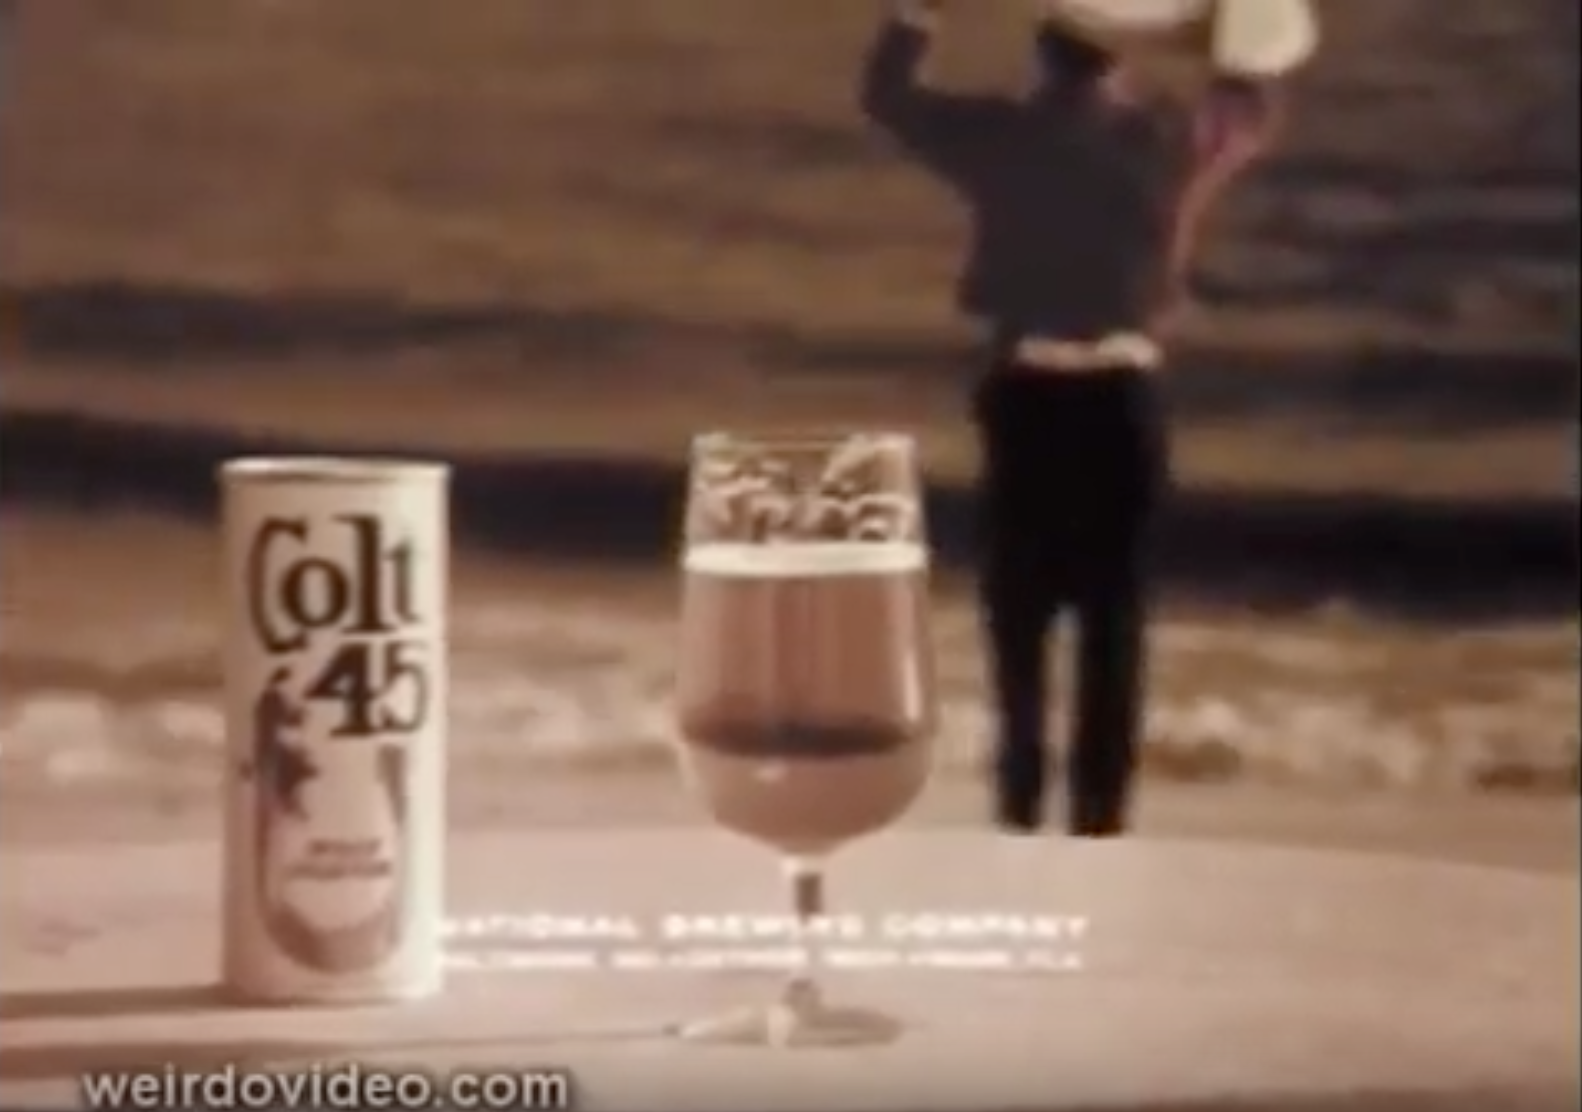 Colt 45 Malt Liquor - 1967